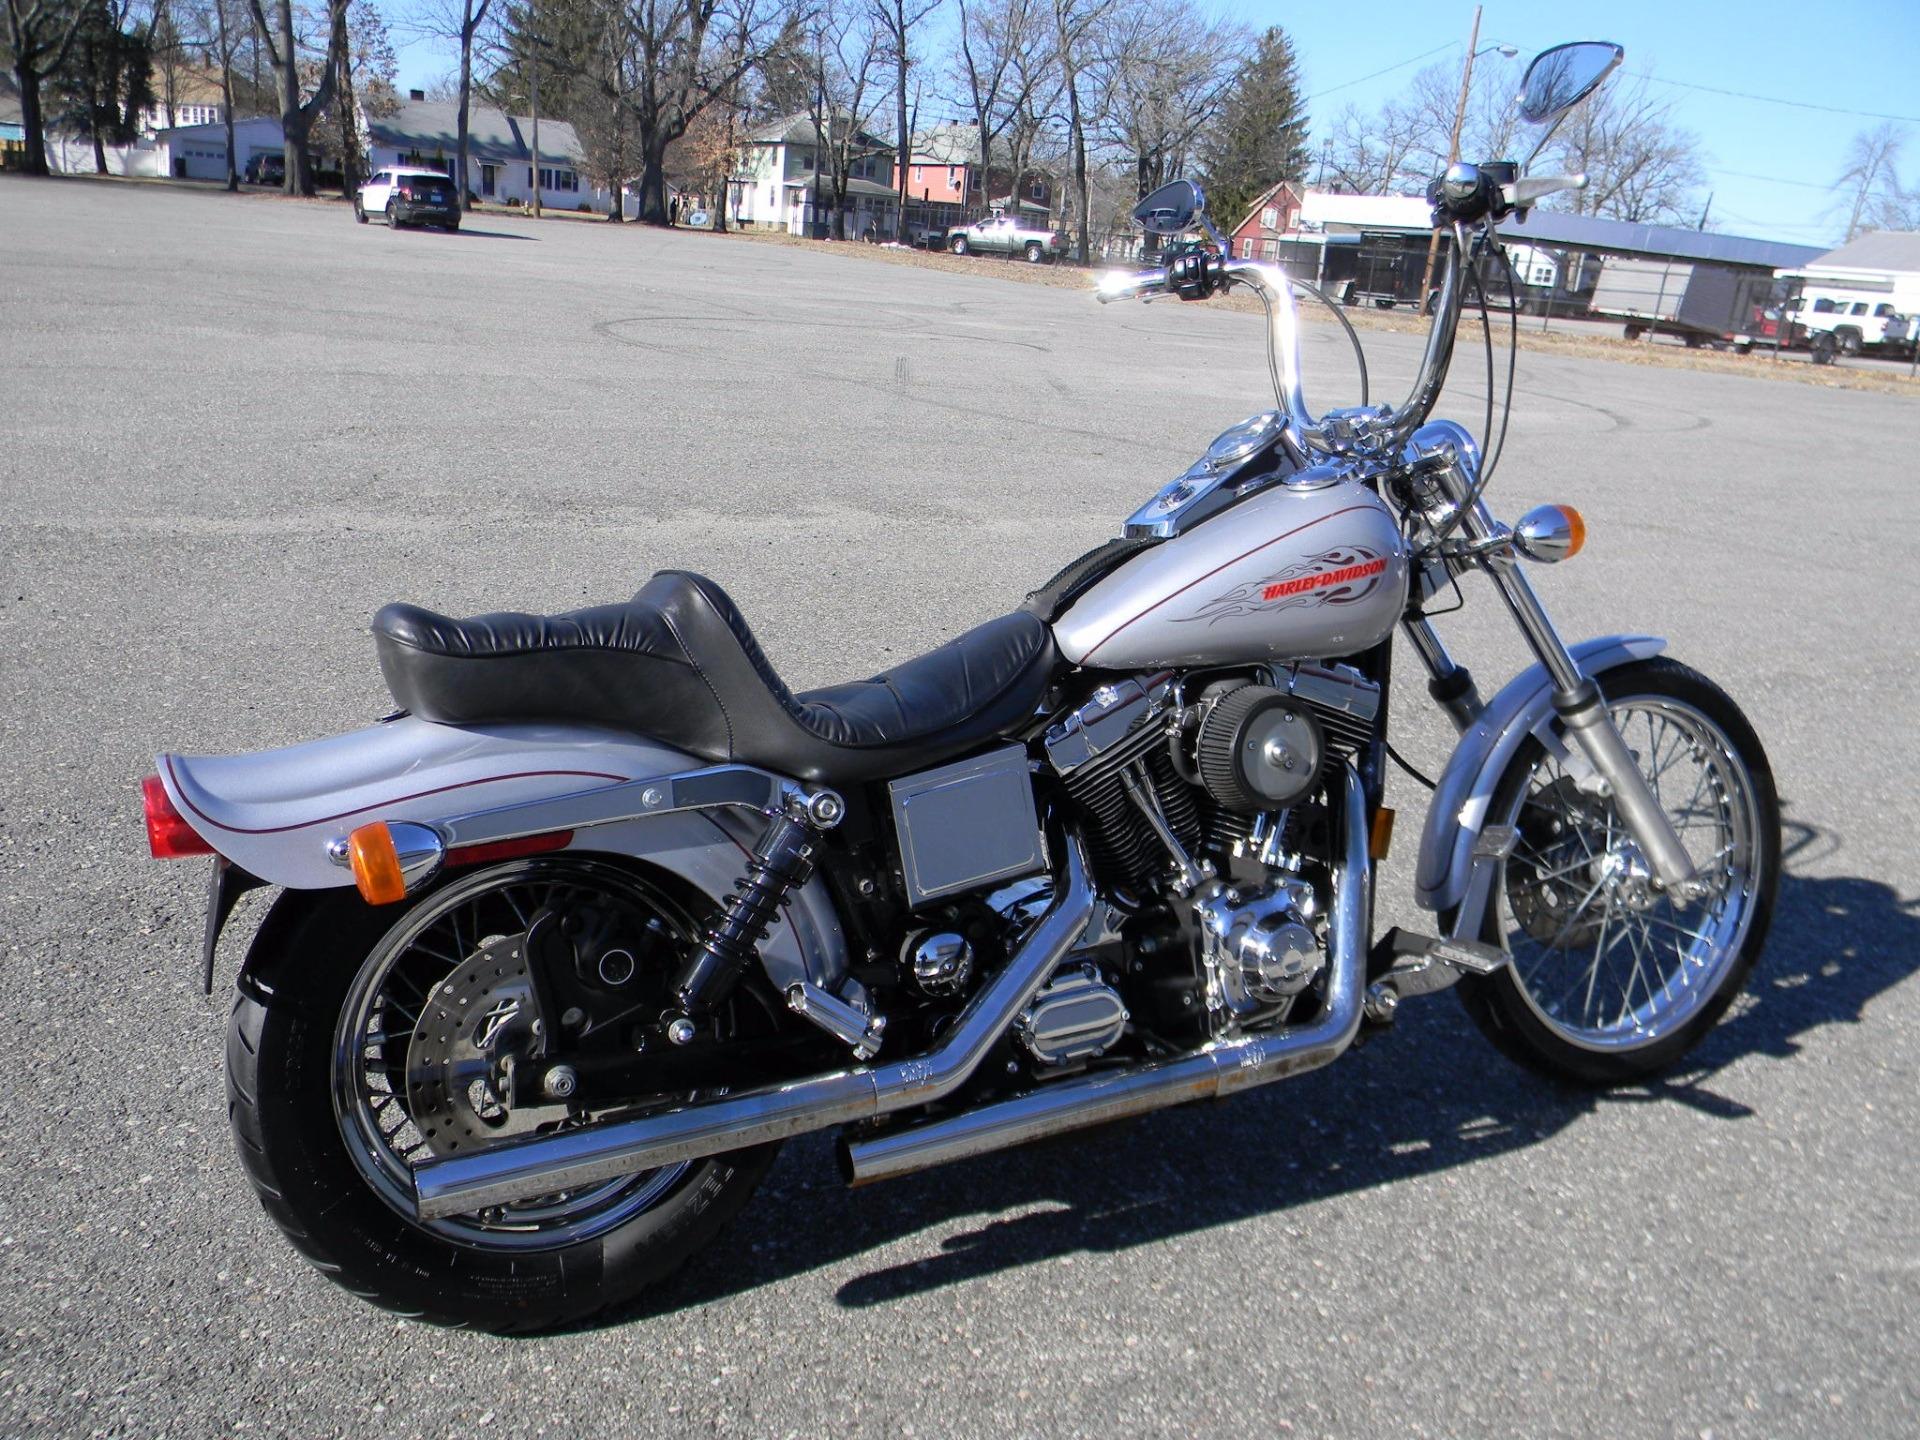 1999 Harley-Davidson FXDWG in Springfield, Massachusetts